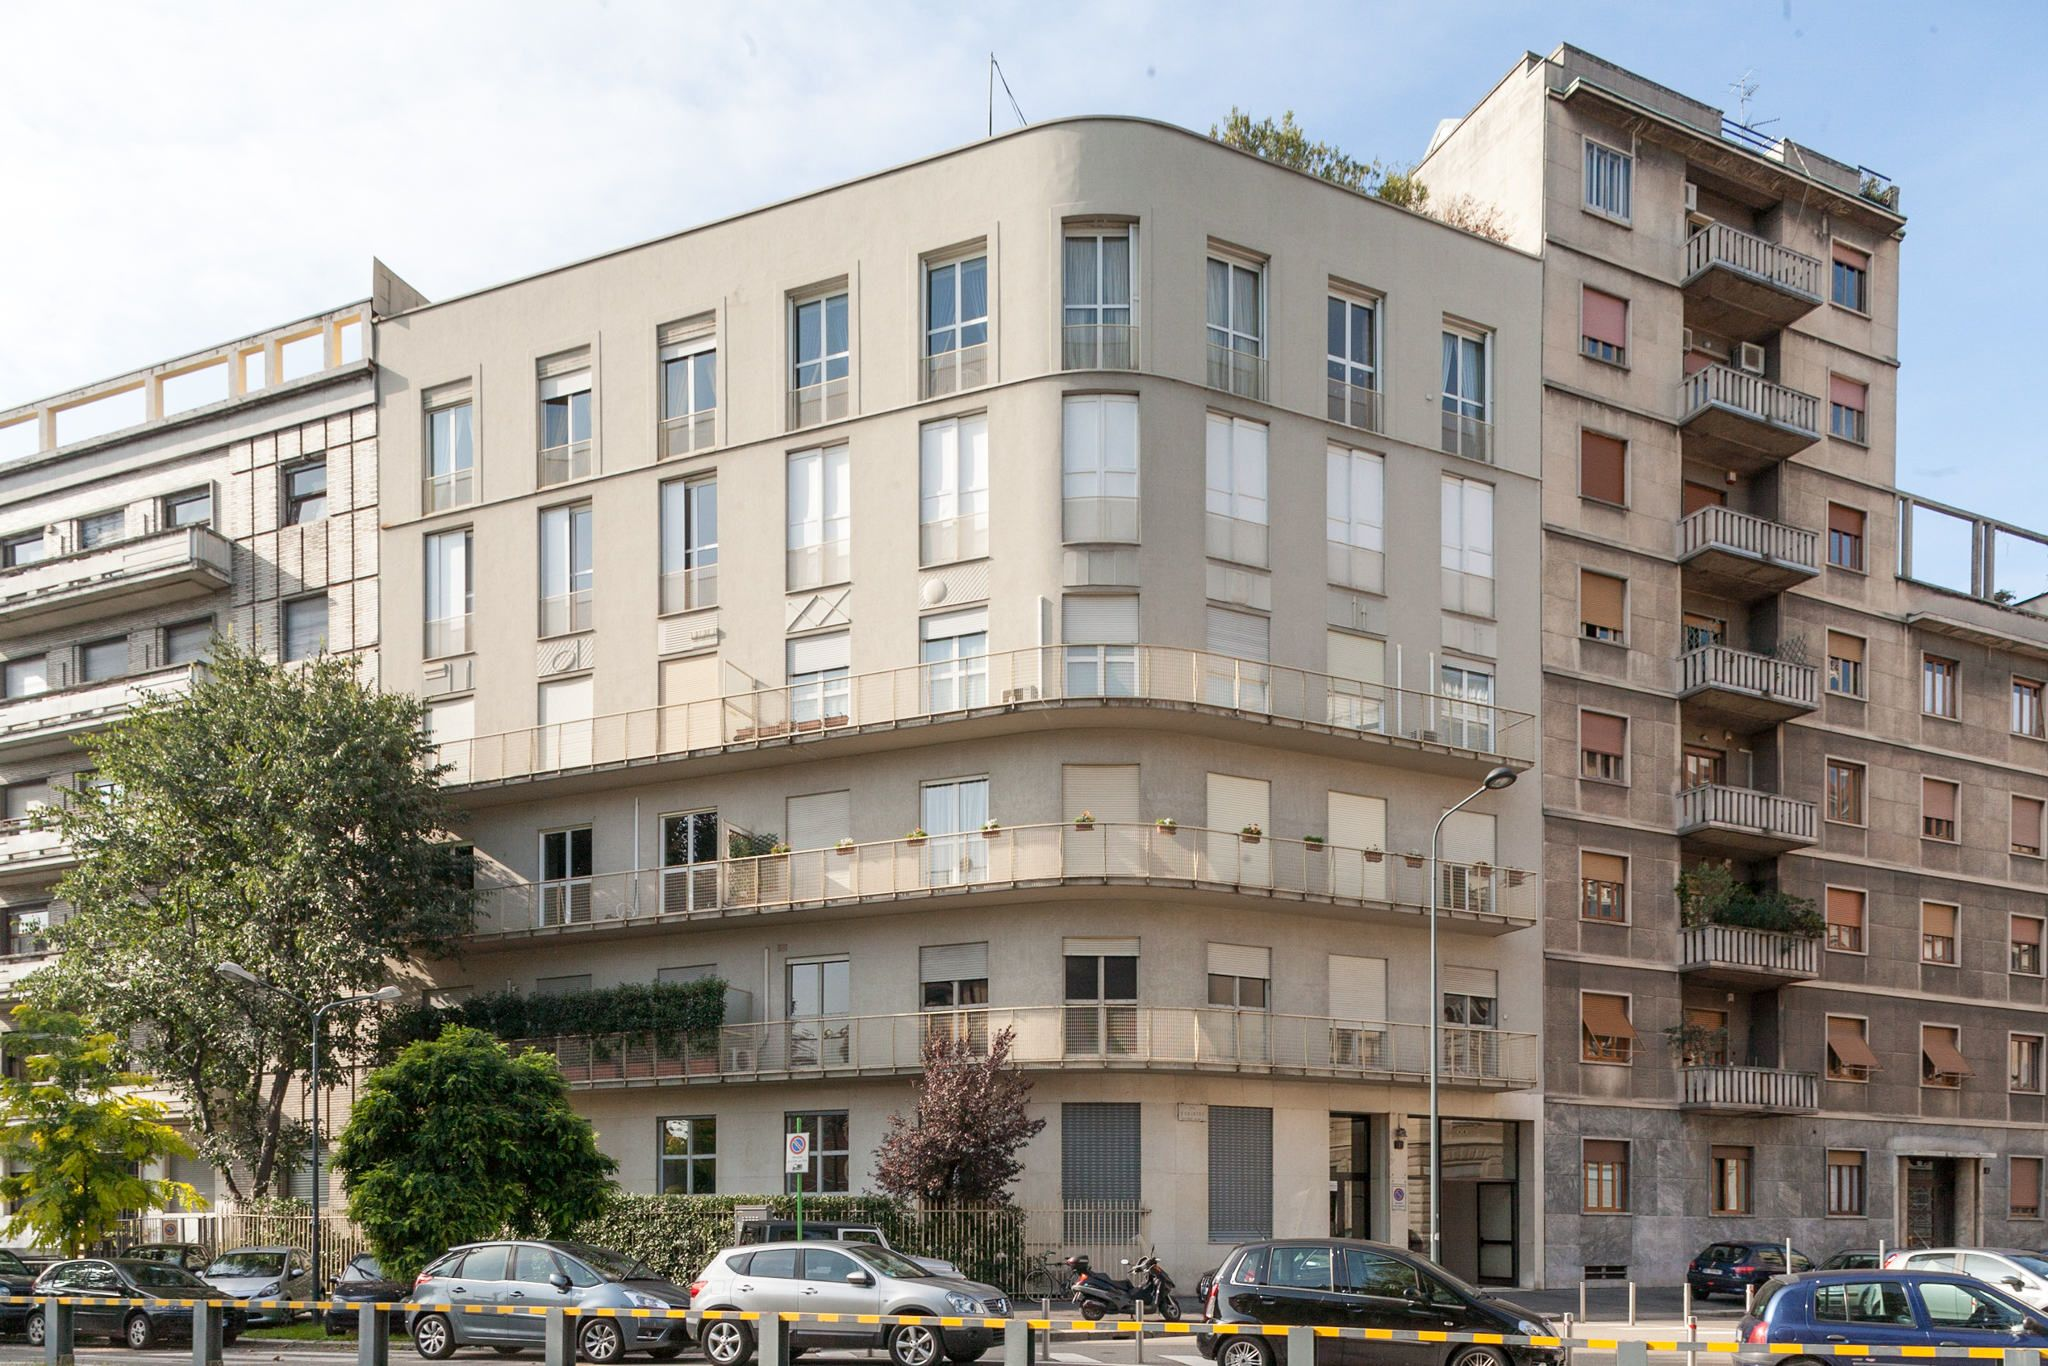 MG5406.jpg Architektur, Fassade, Mailand